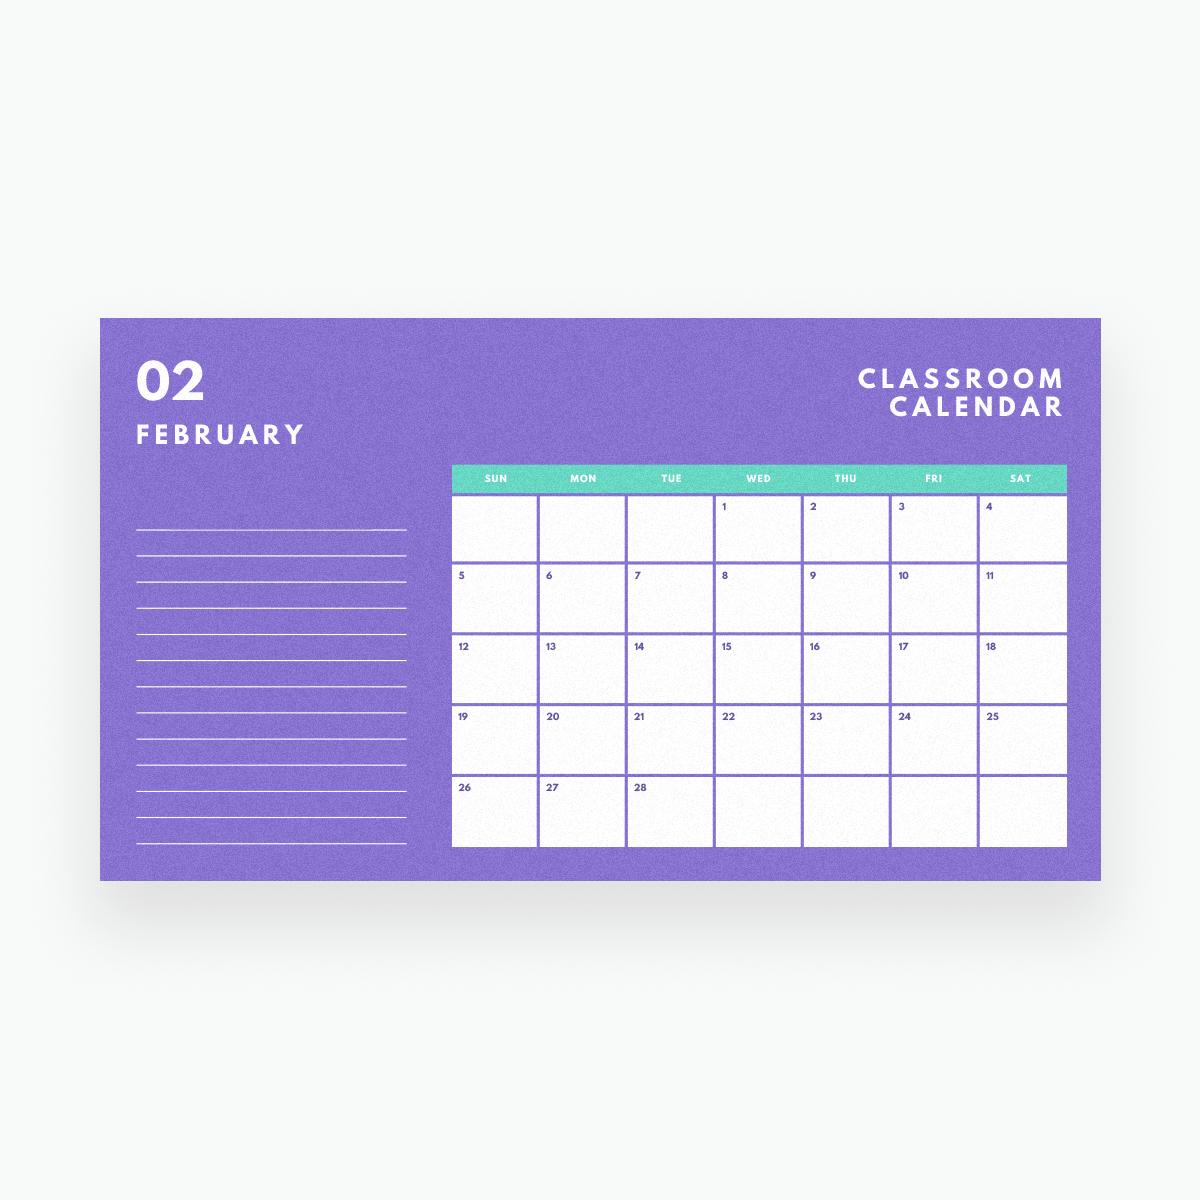 Online Free Calendar Maker 2016 Create Printable Calendar Pdf Timeanddate Free Online Calendar Maker Design A Custom Calendar Canva